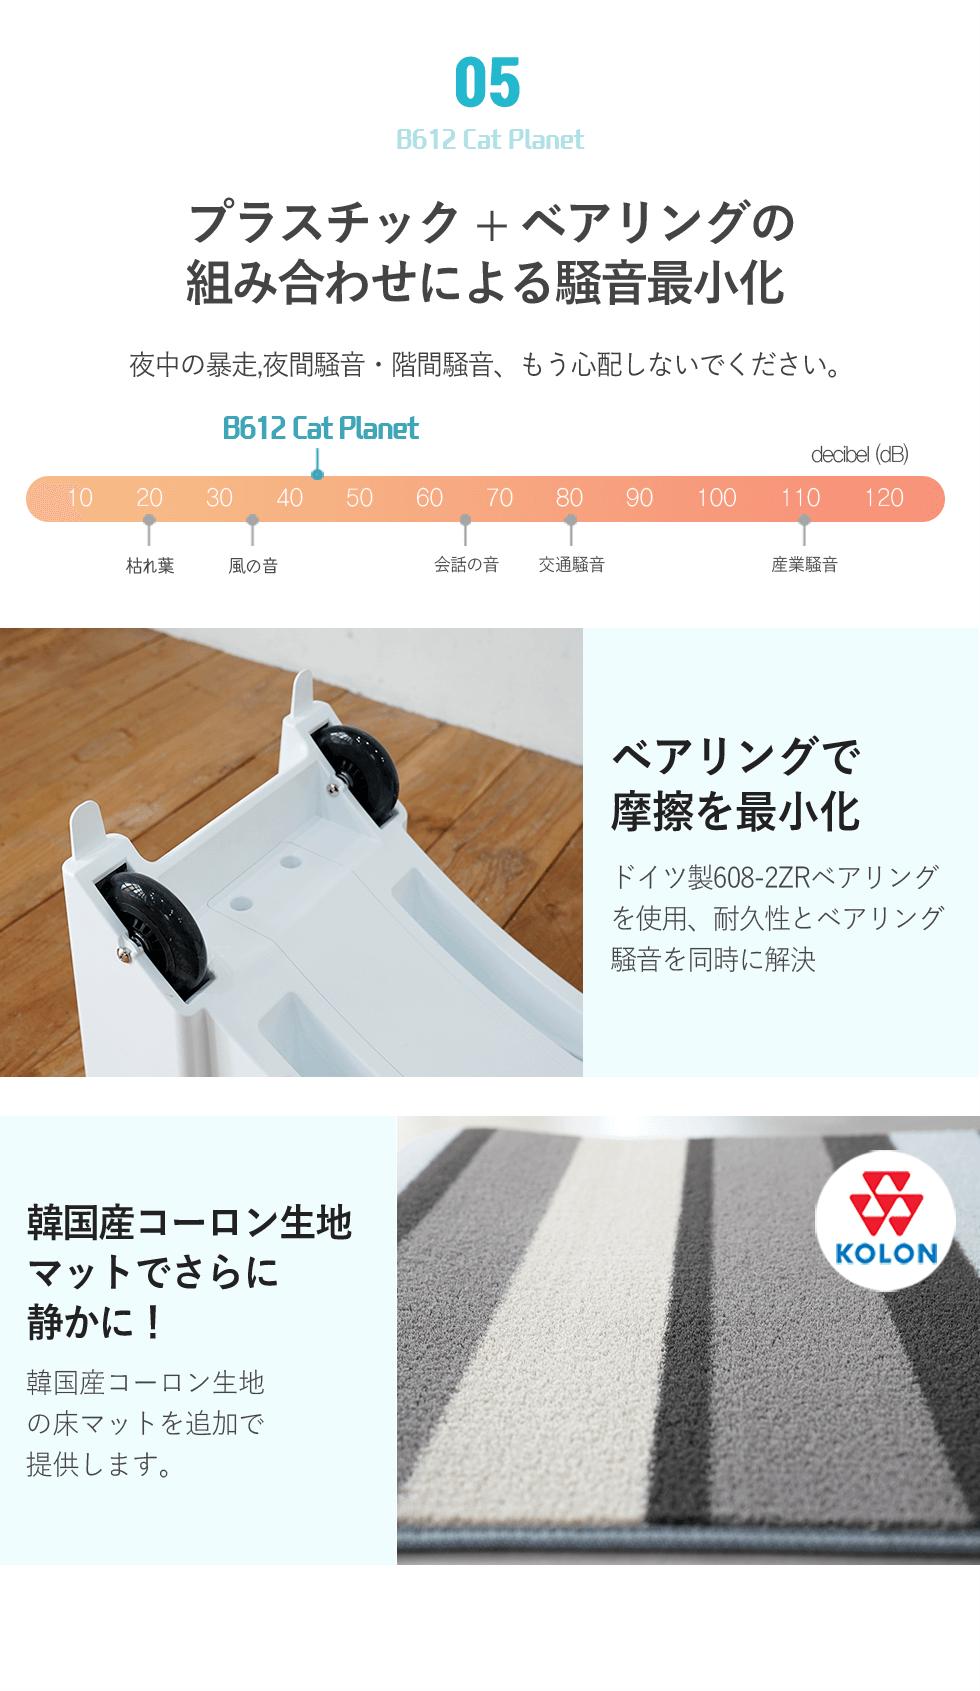 japan_detail_06_02.png